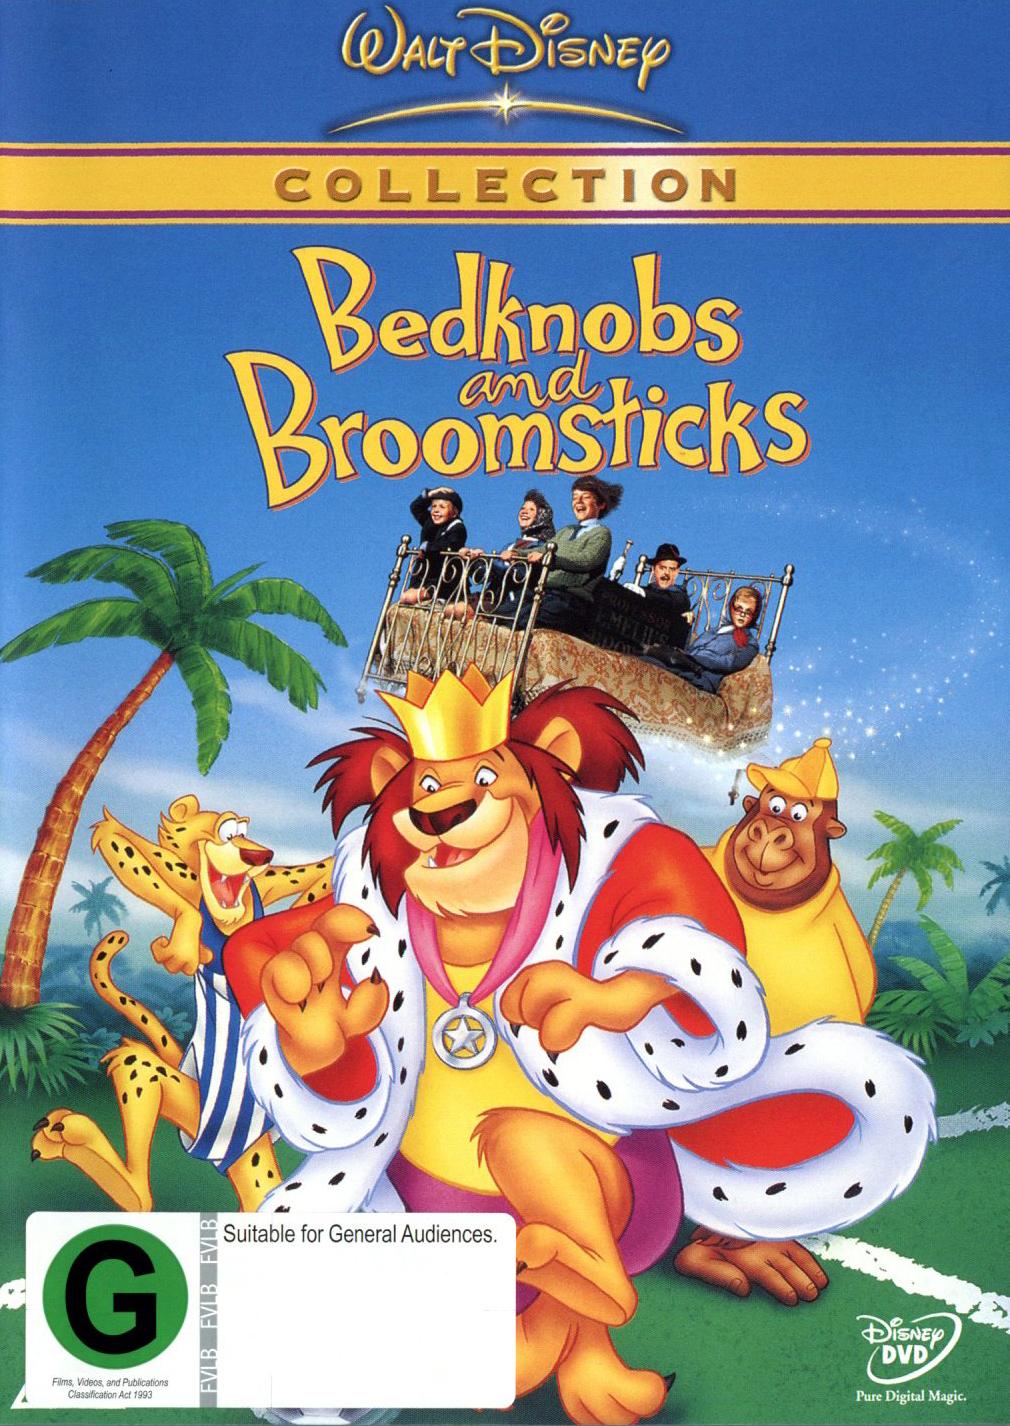 Bedknobs & Broomsticks (1971) on DVD image